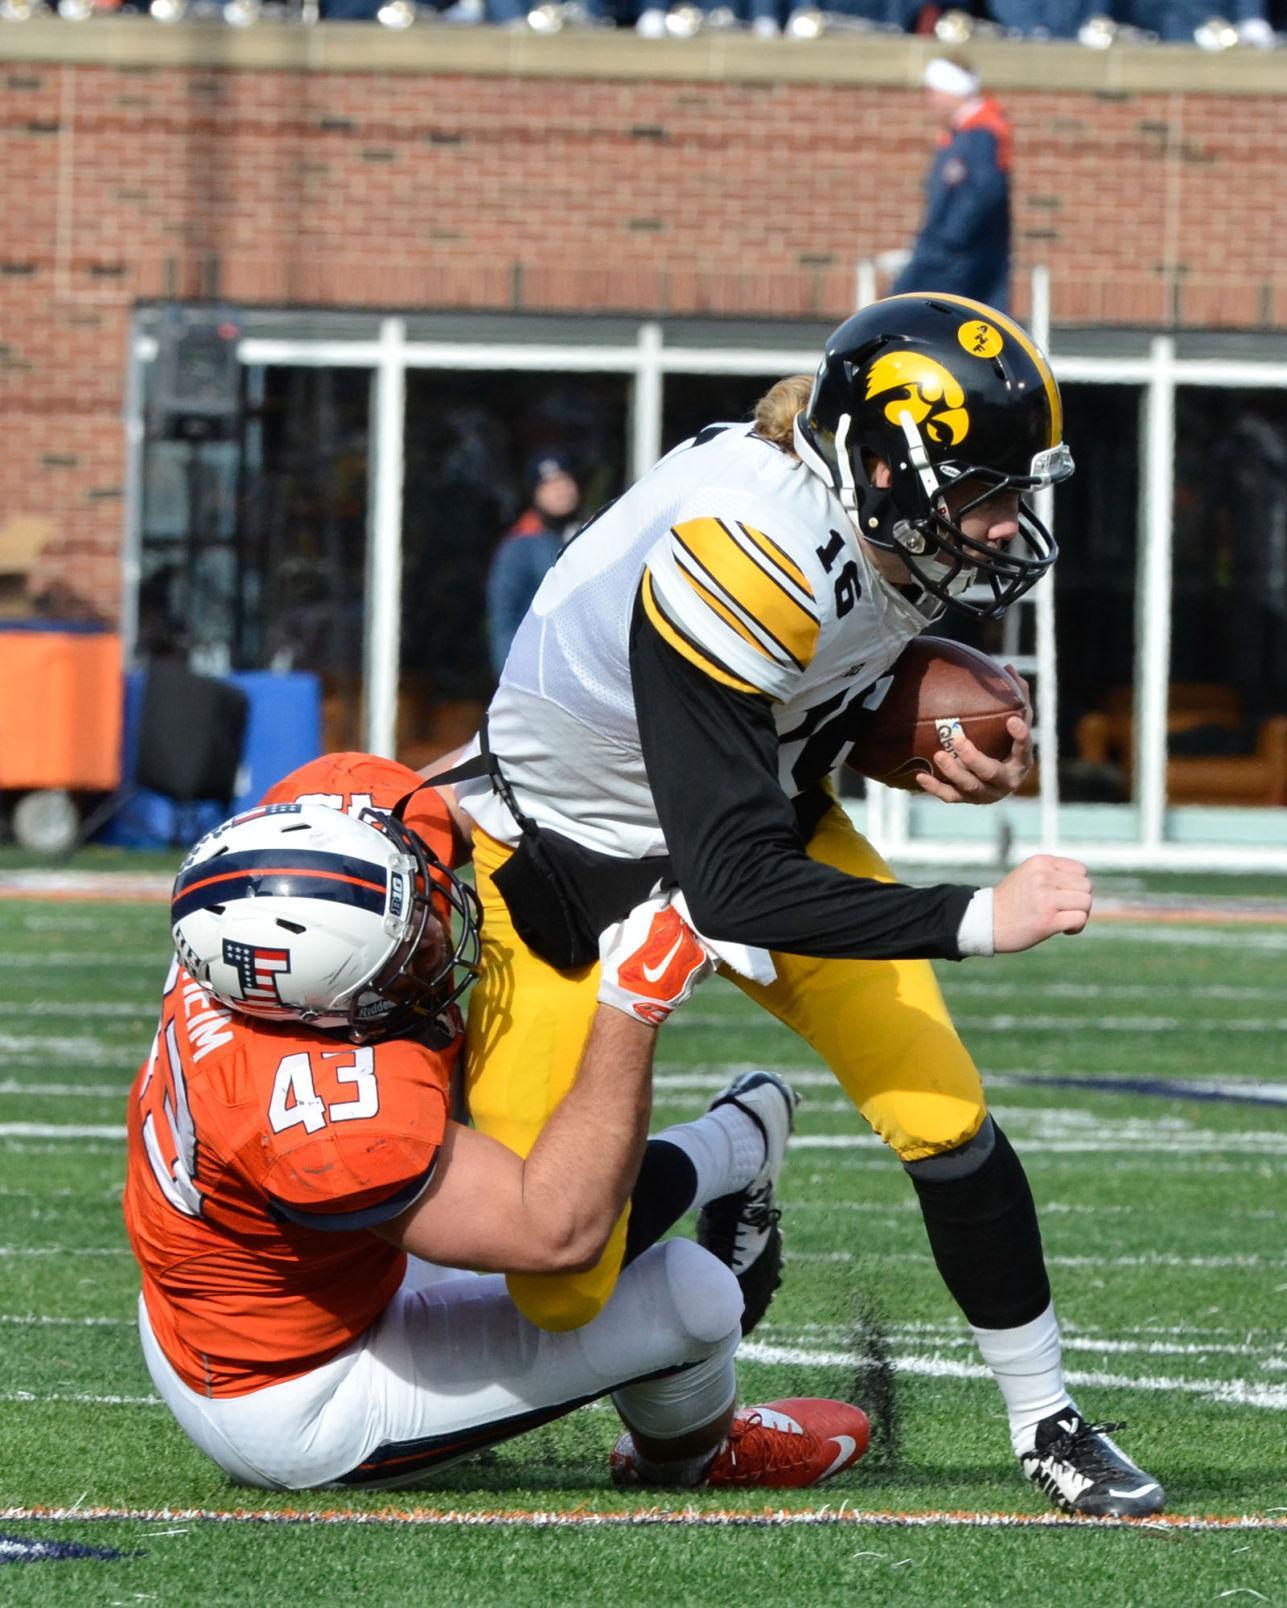 Illinois' Mason Monheim tackles Iowa's C.J. Beathard during a game at Memorial Stadium on Nov. 15. Monheim enters his senior year with a spot on multiple preseason watch lists.